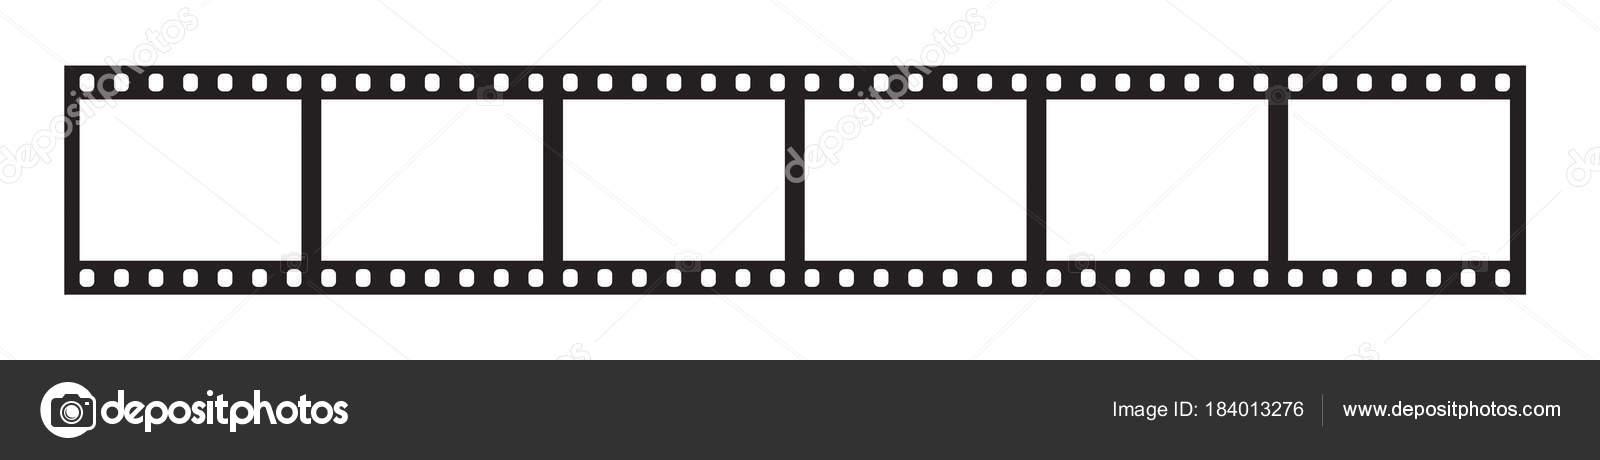 Seis marcos de tira de película de 35 mm — Archivo Imágenes ...